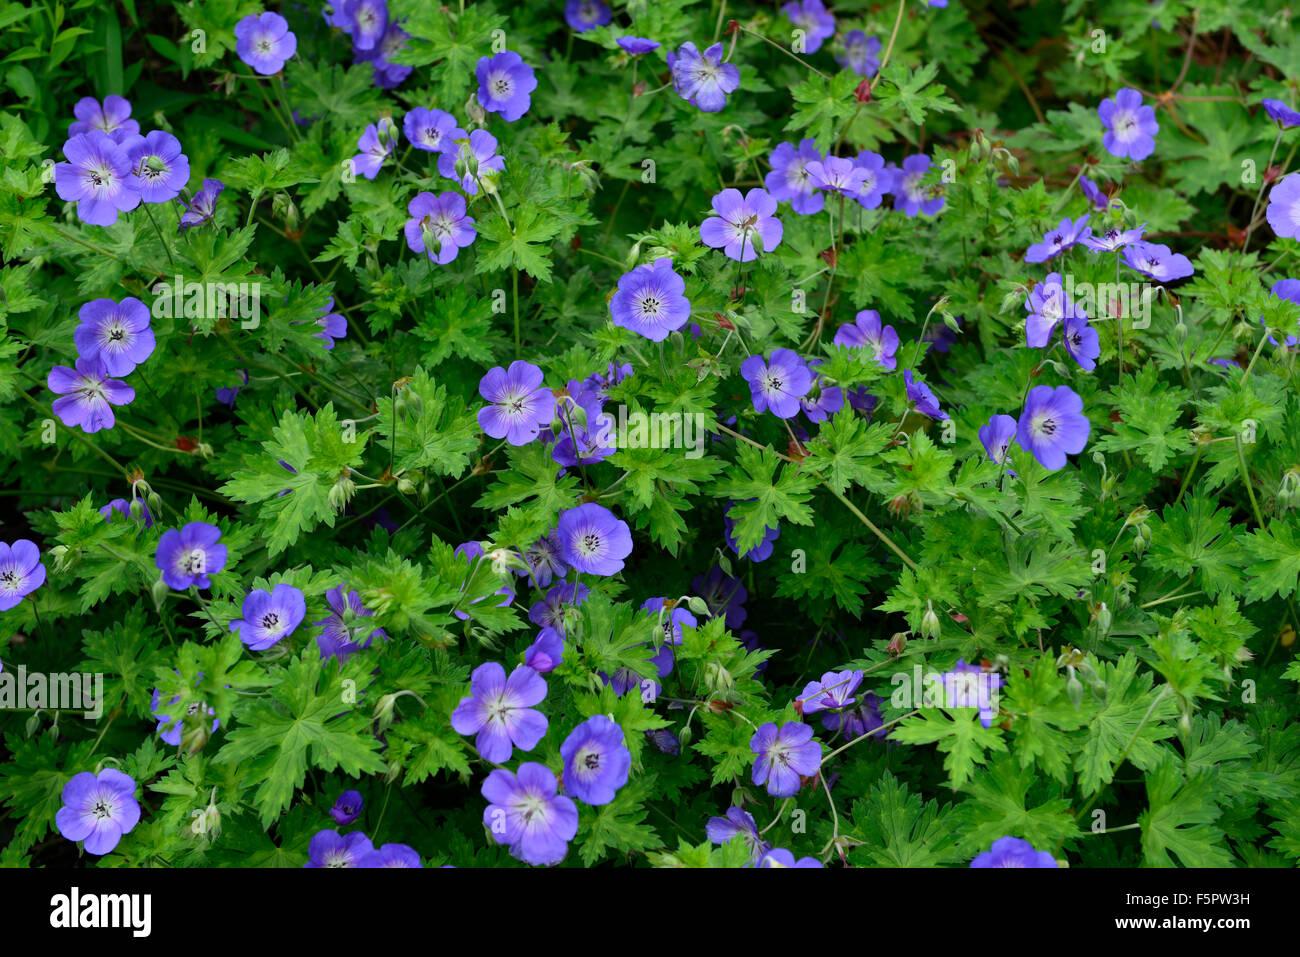 Geranium Rozanne Blue Flower Flowers Flowering Perennial Plant Stock